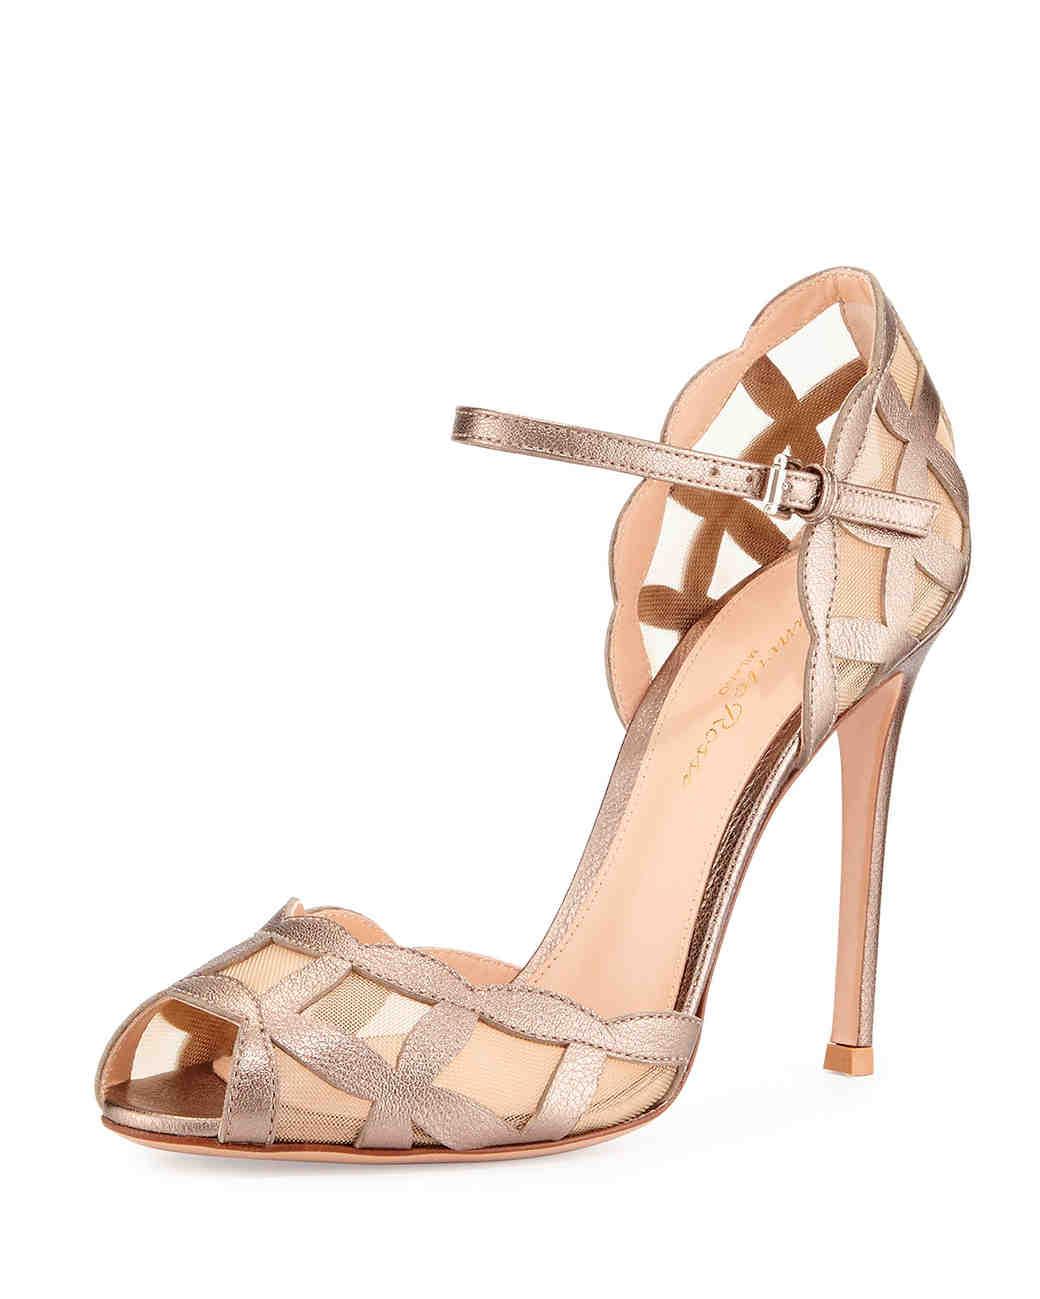 mesh-wedding-shoes-gianvito-rossi-sandal-0315.jpg